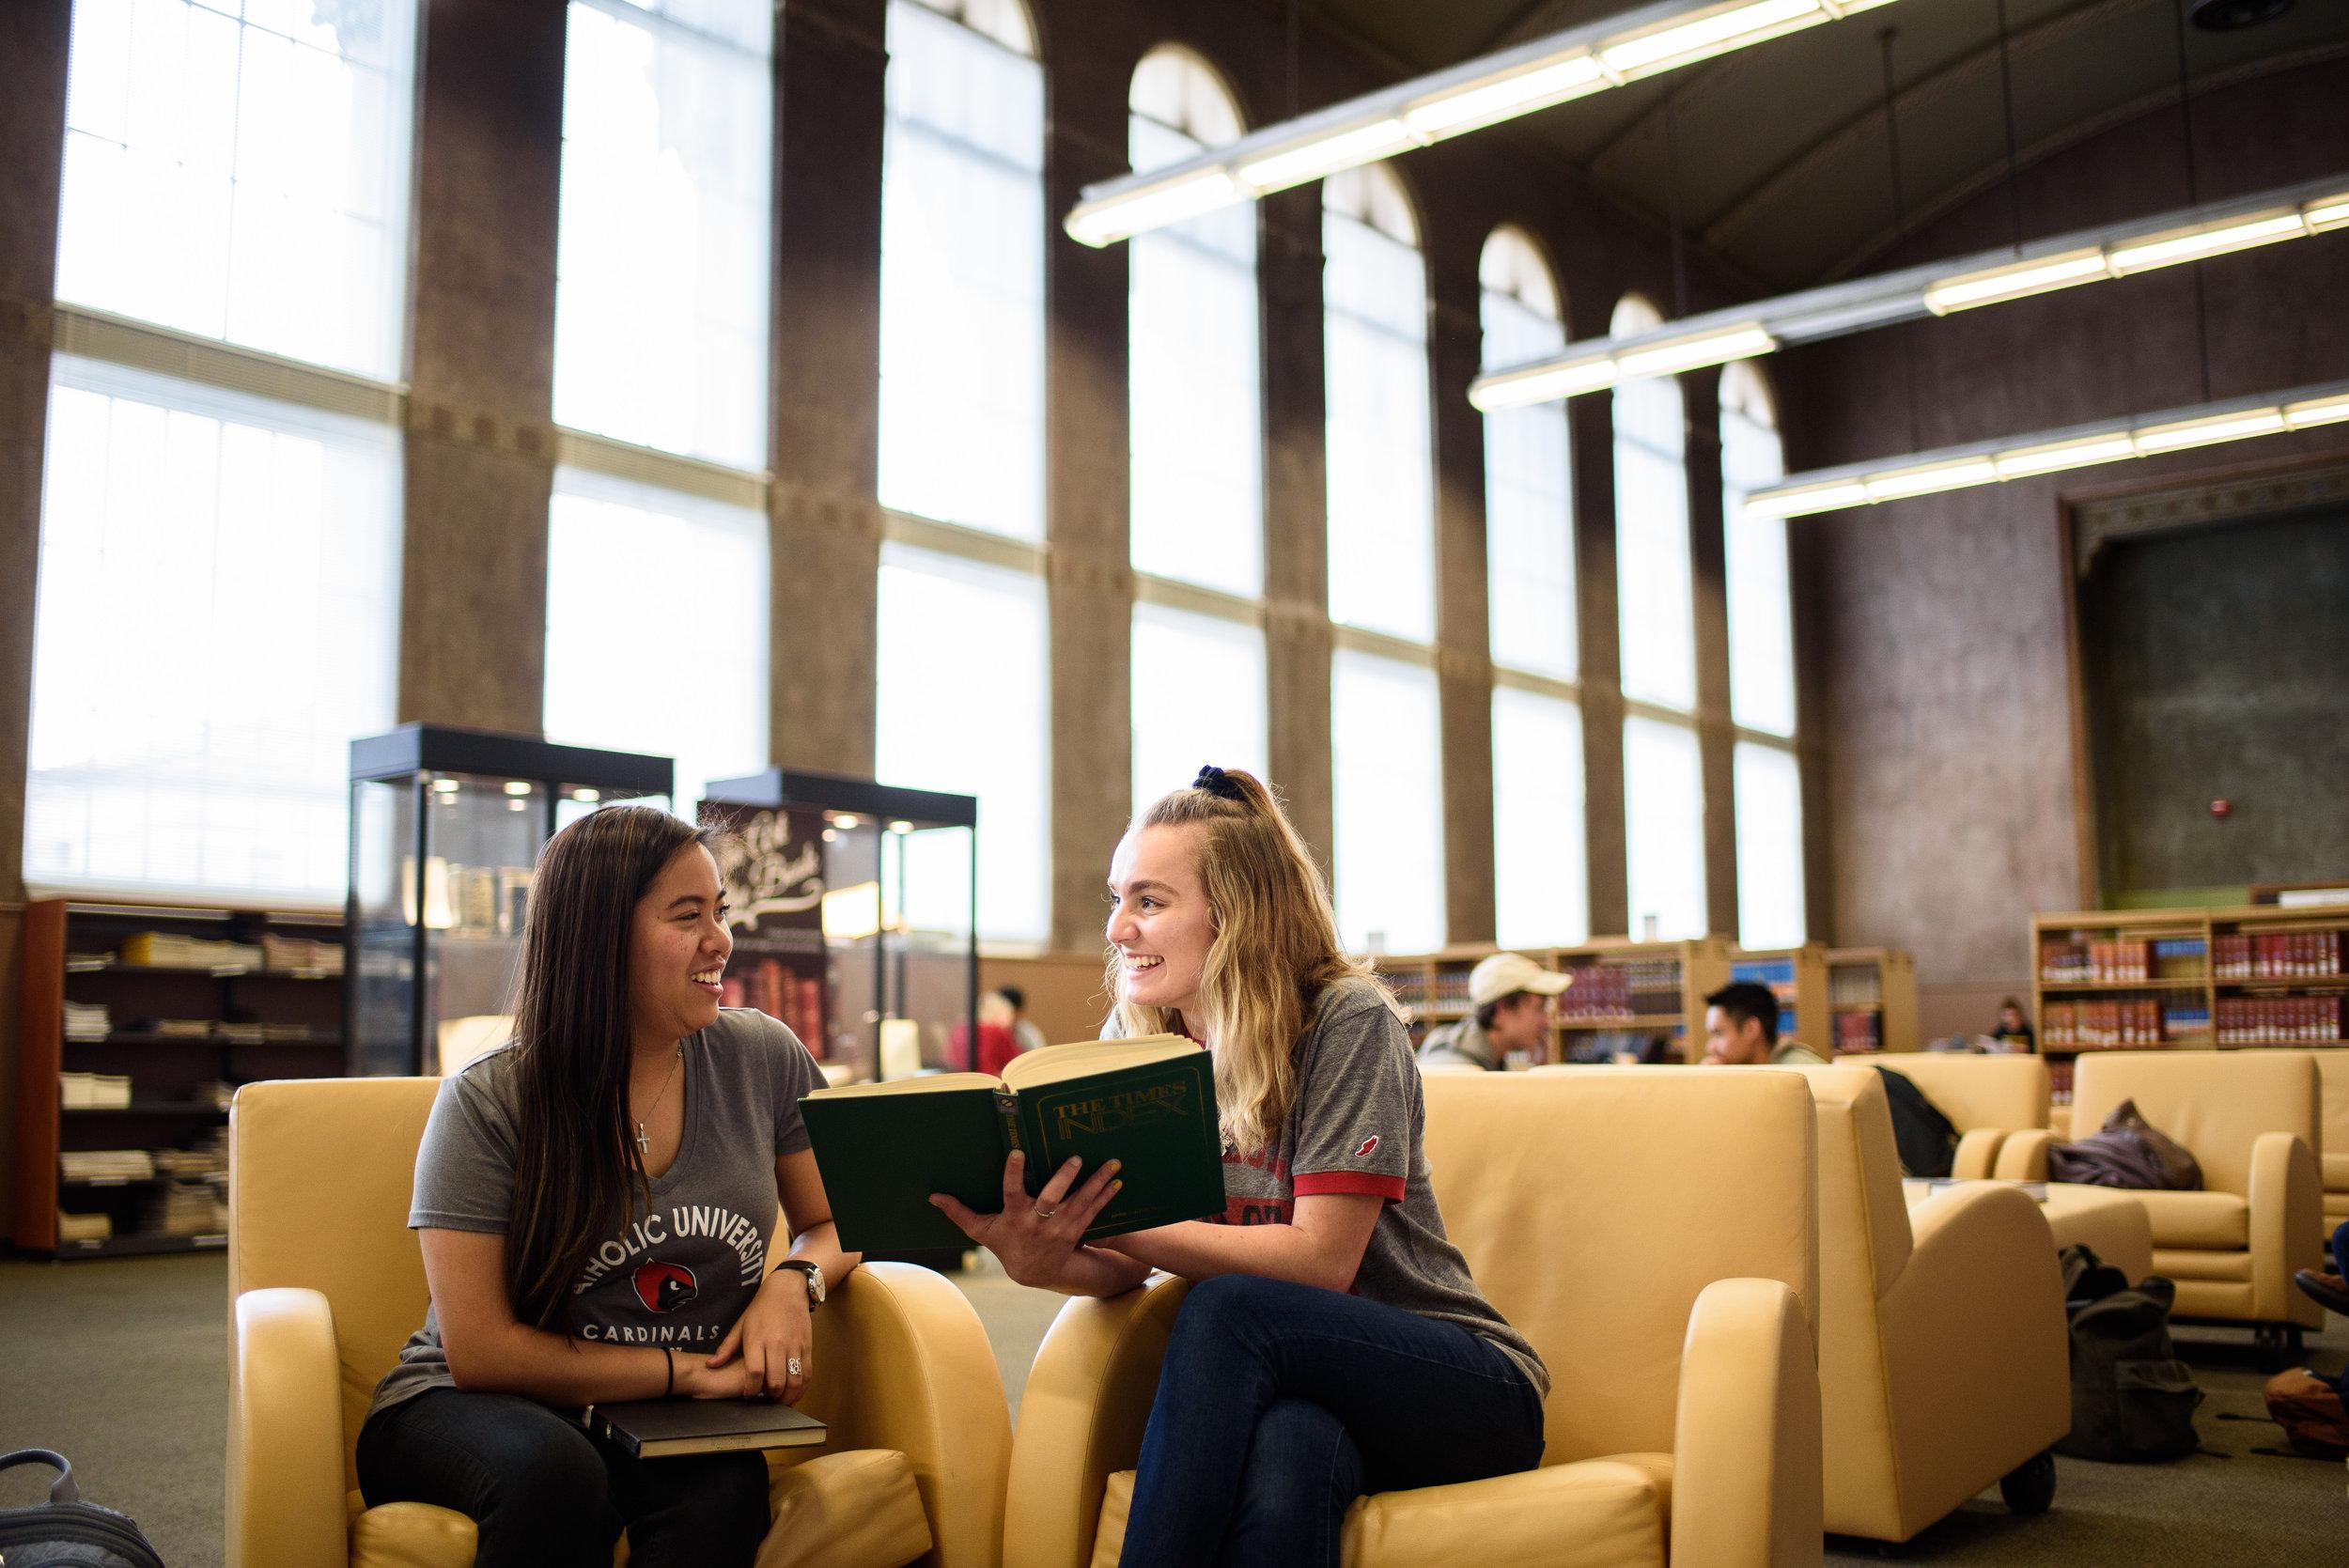 Catholic University of America. CUA Mullen Library.